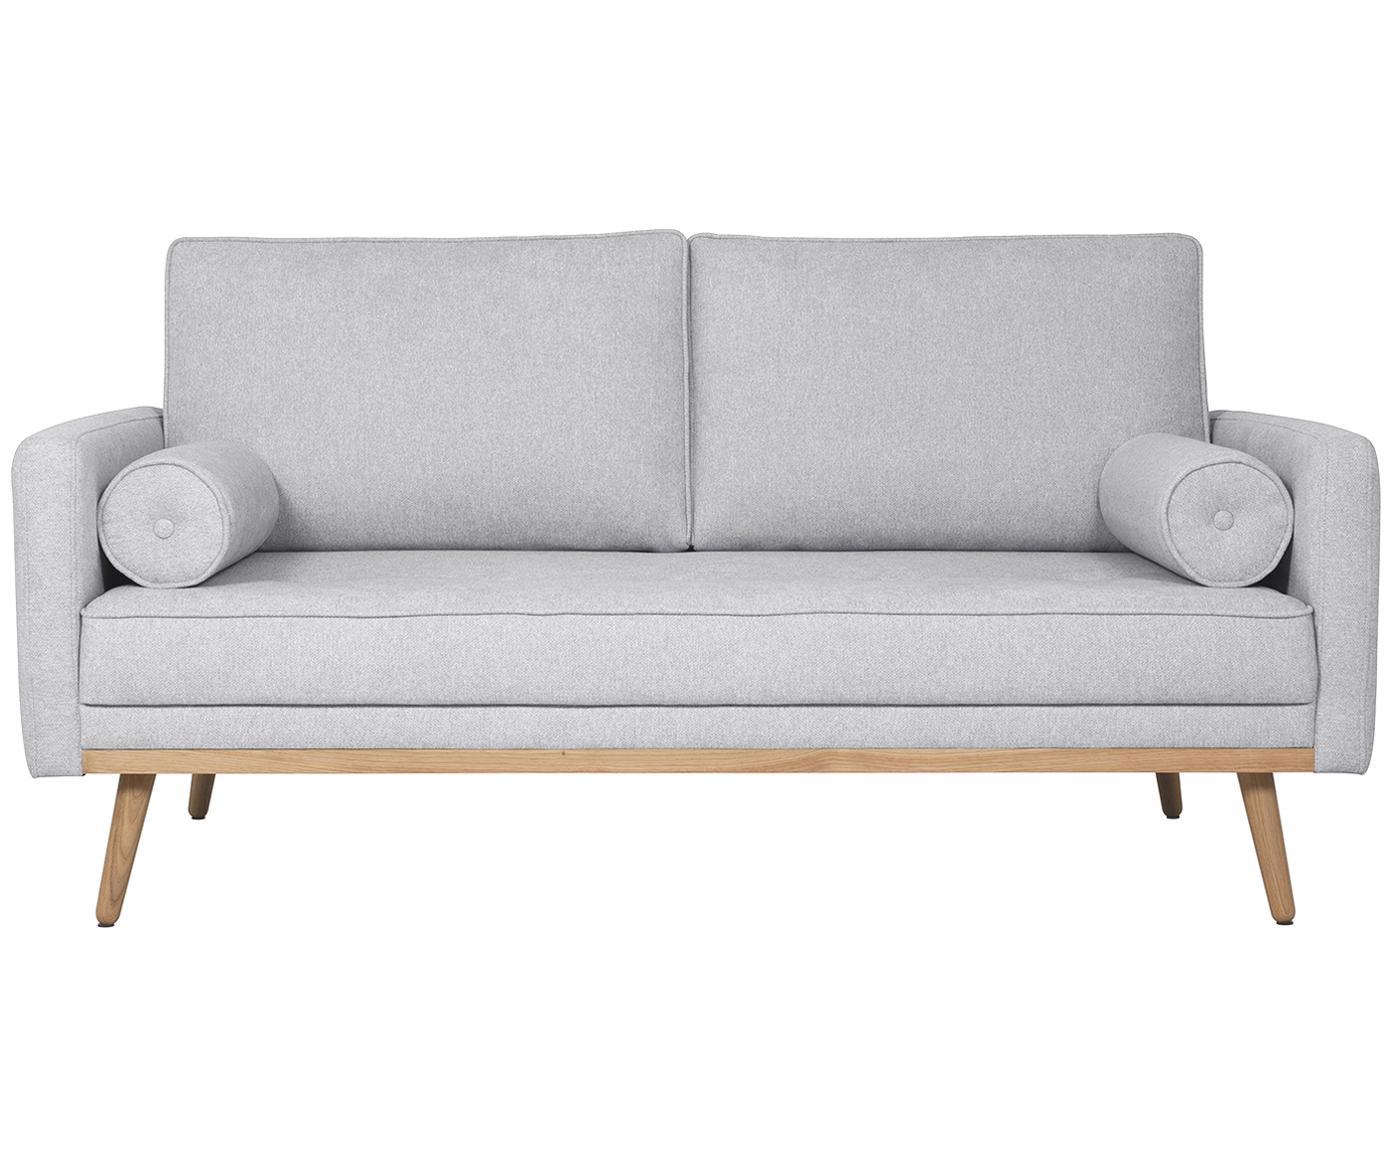 Bank Saint (2-zits), Bekleding: polyester, Frame: massief grenenhout, spaan, Lichtgrijs, B 169 x D 93 cm